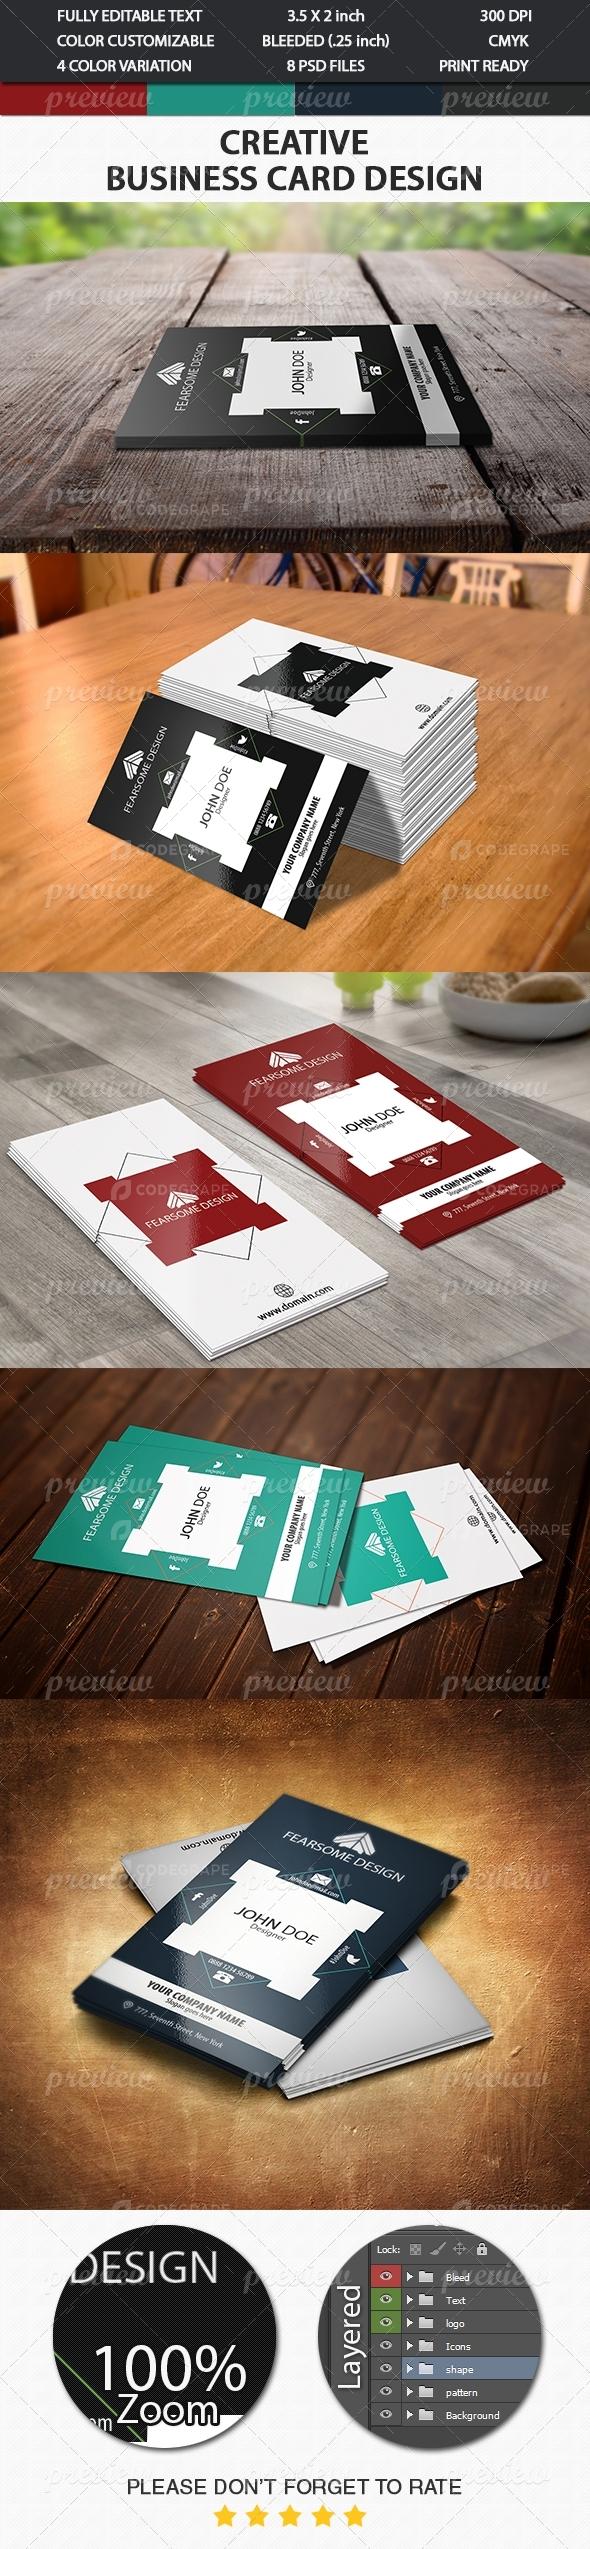 Creative Business Card 7